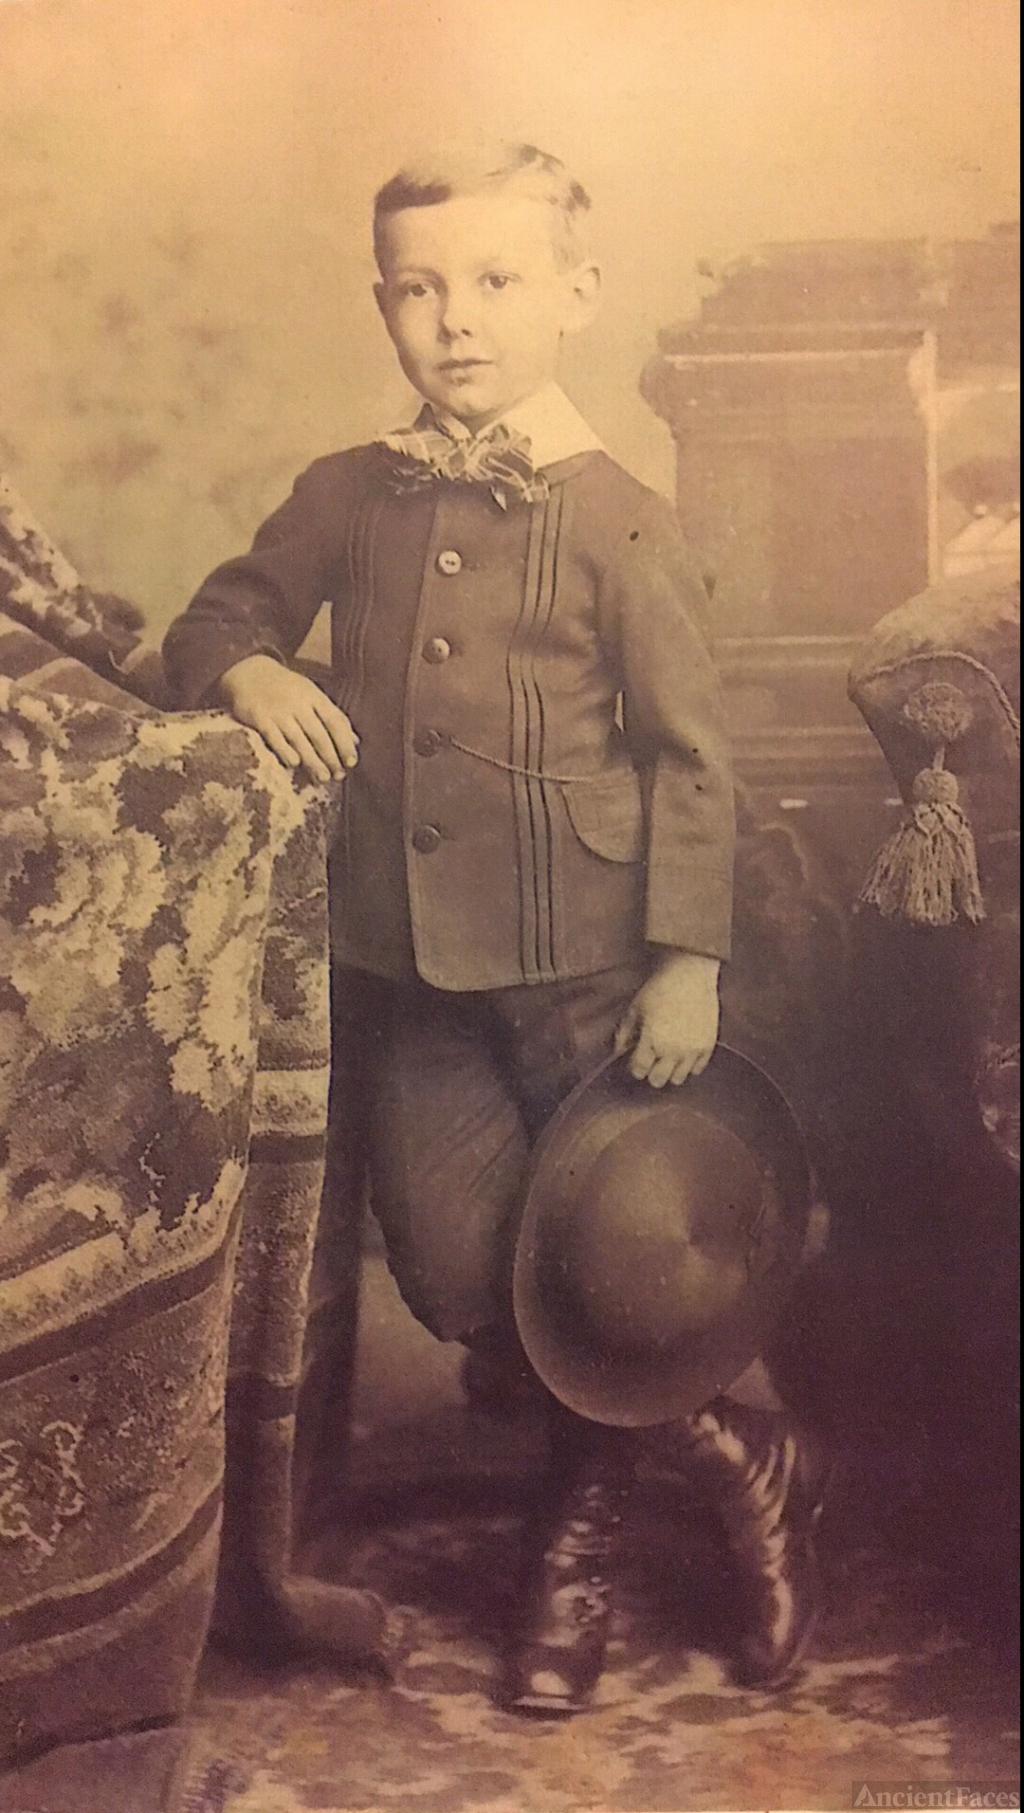 Robert Royal Corkhill